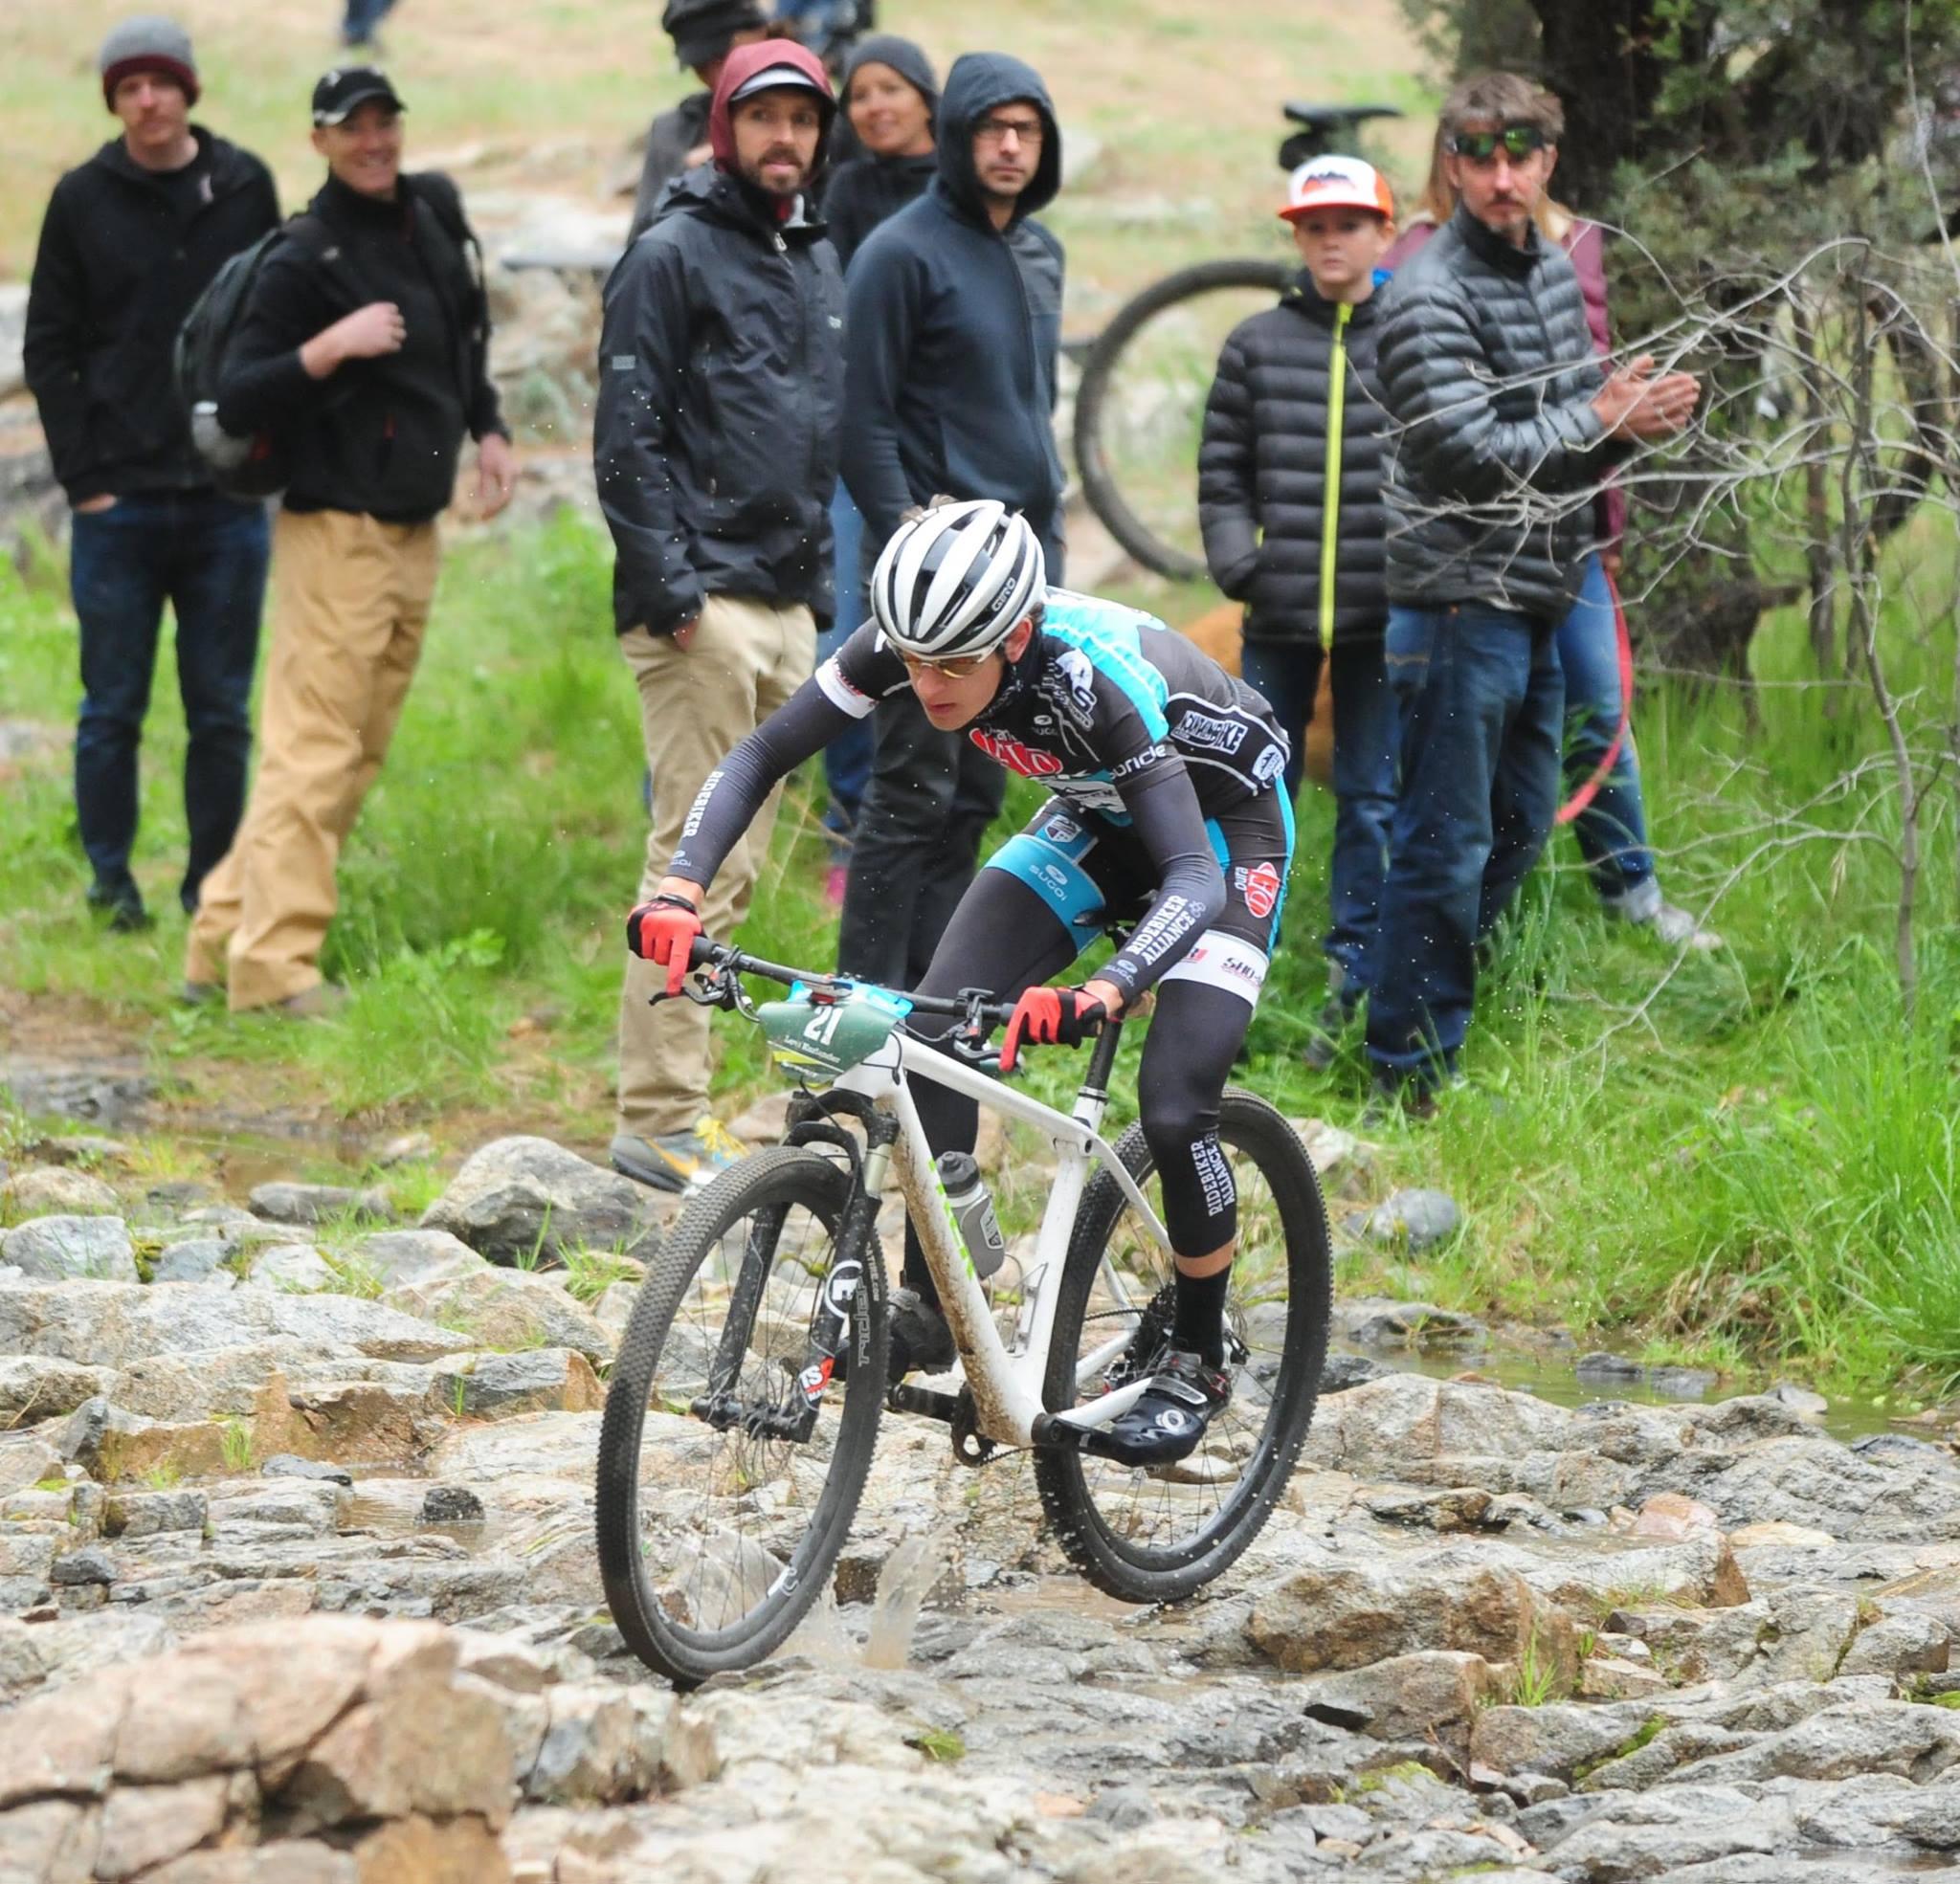 If mountain bike racing was easy, everyone would do it! Photo:  Les Stukenberg